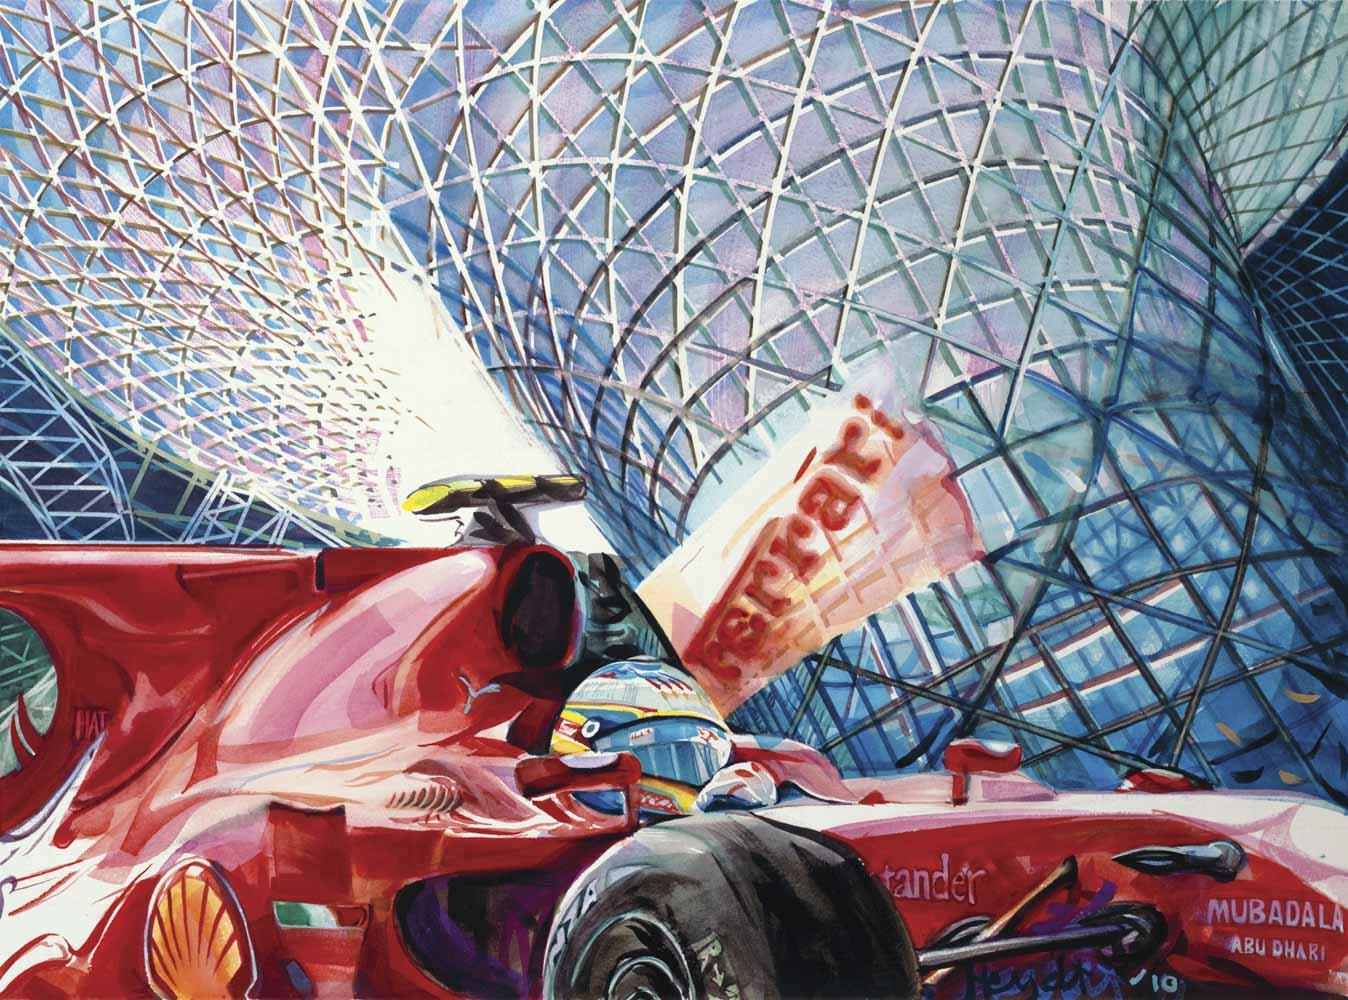 Ferrari passes under the Yas Hotel